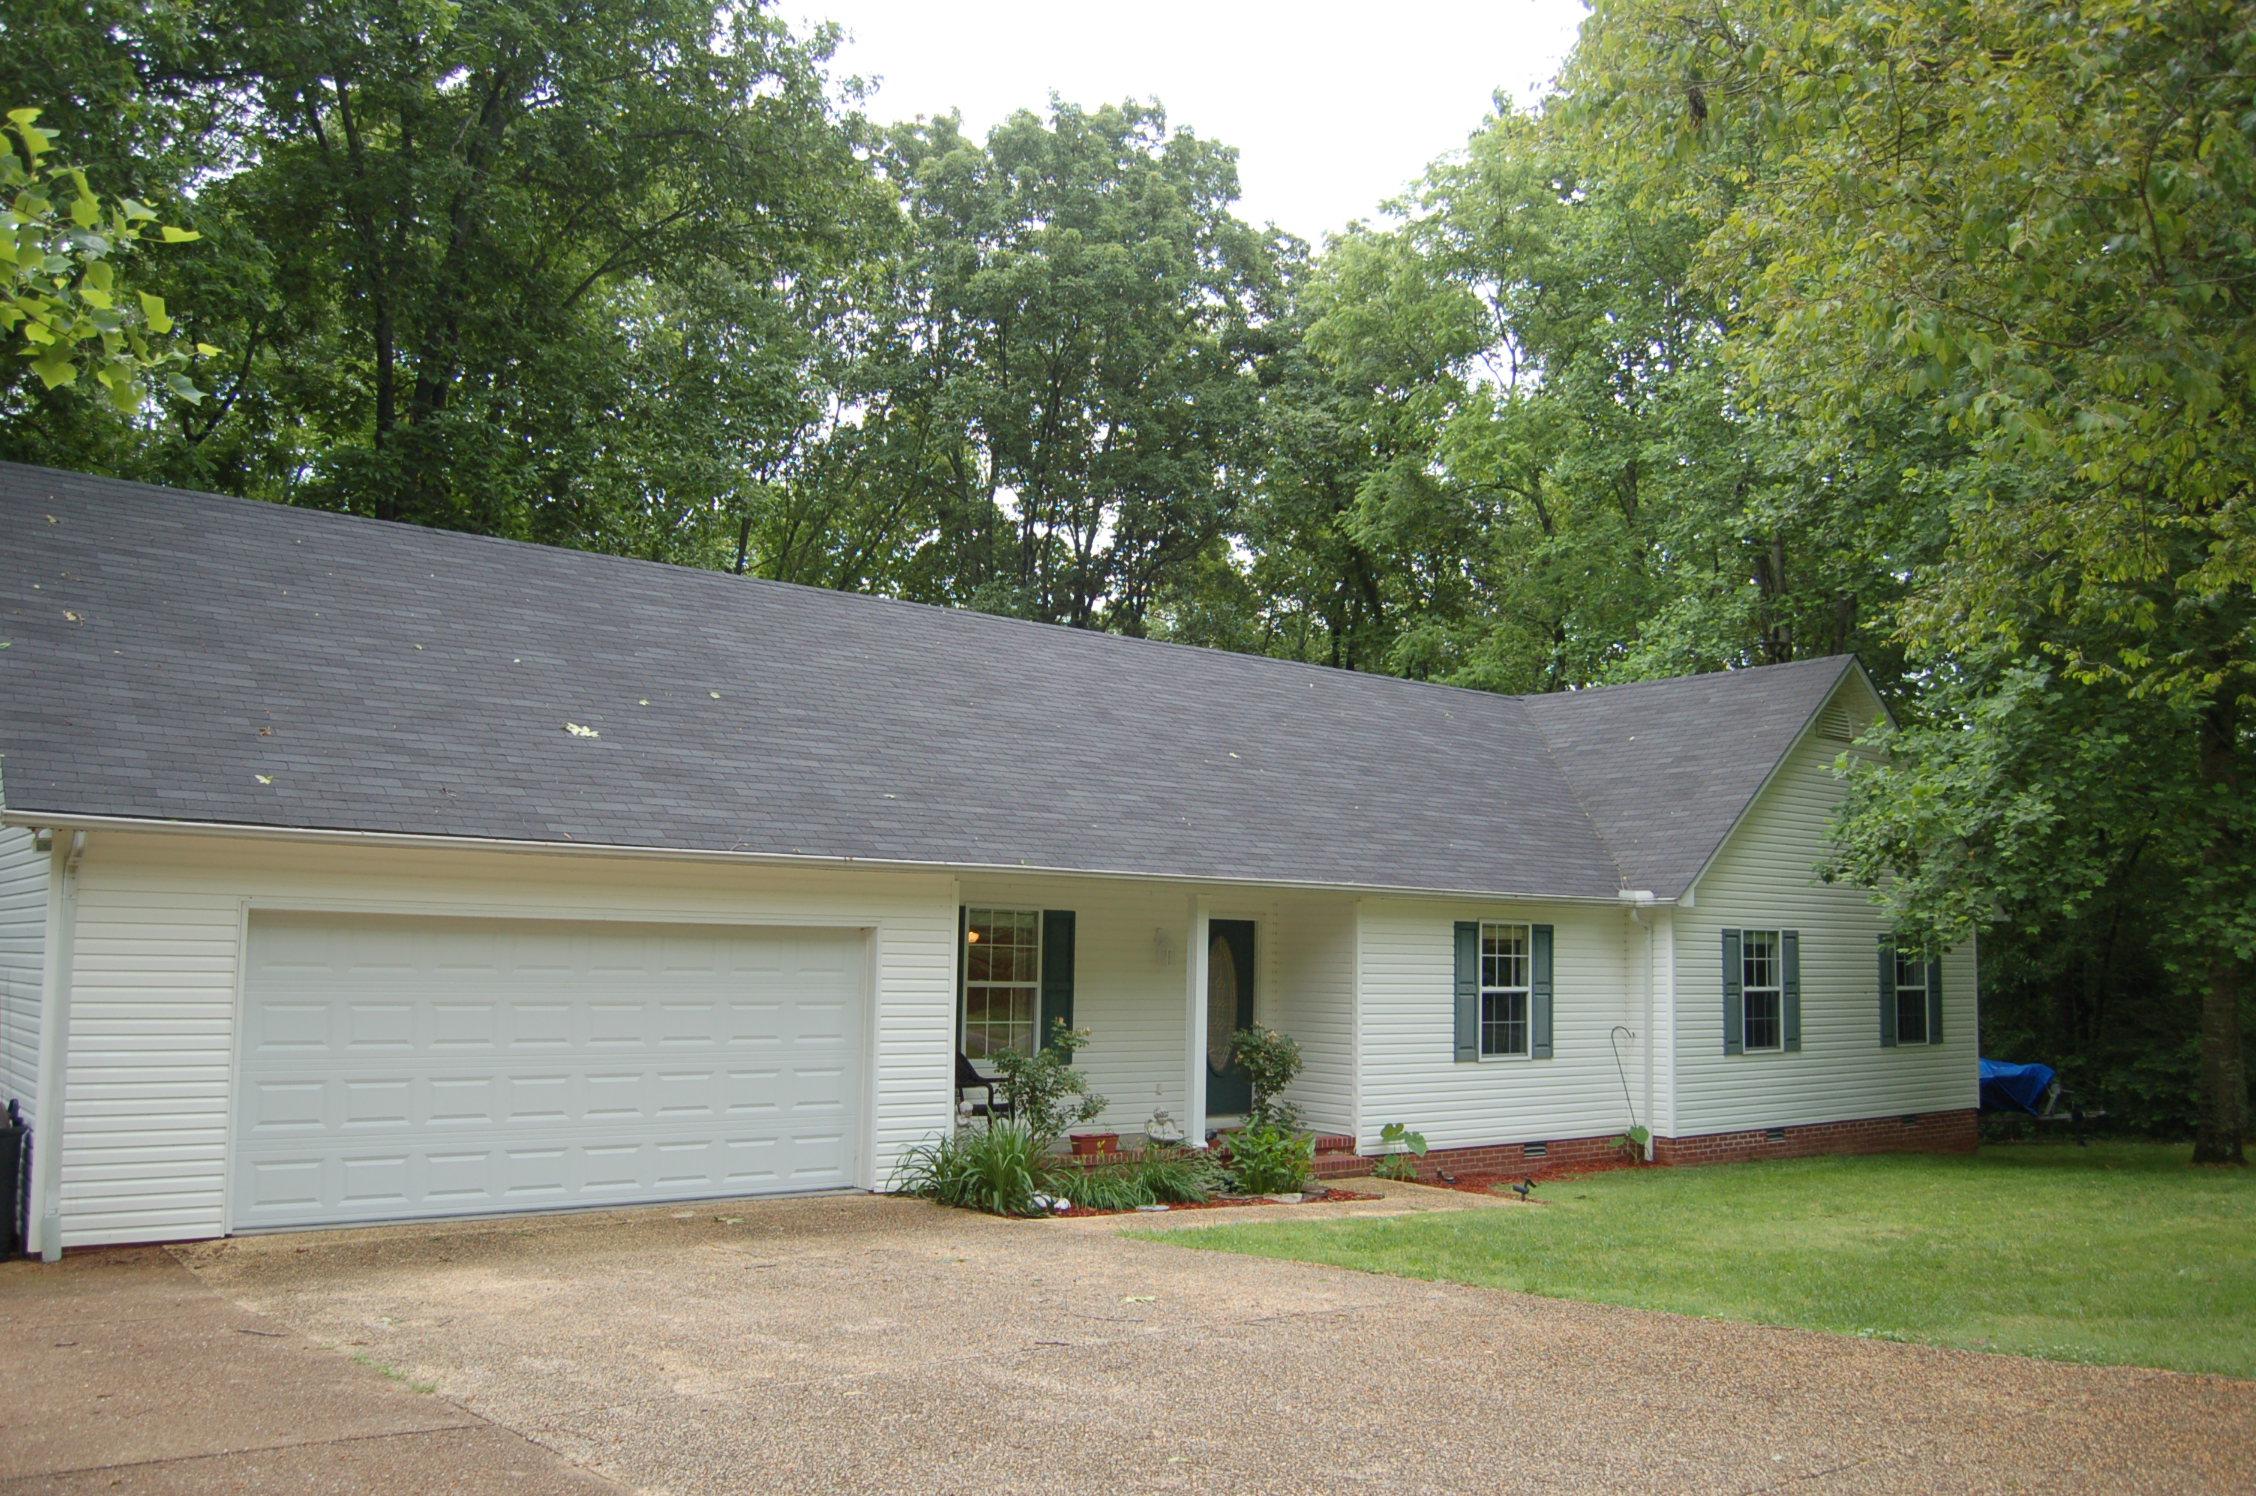 24446 POPLAR DRIVE, Elkmont, Alabama 35620